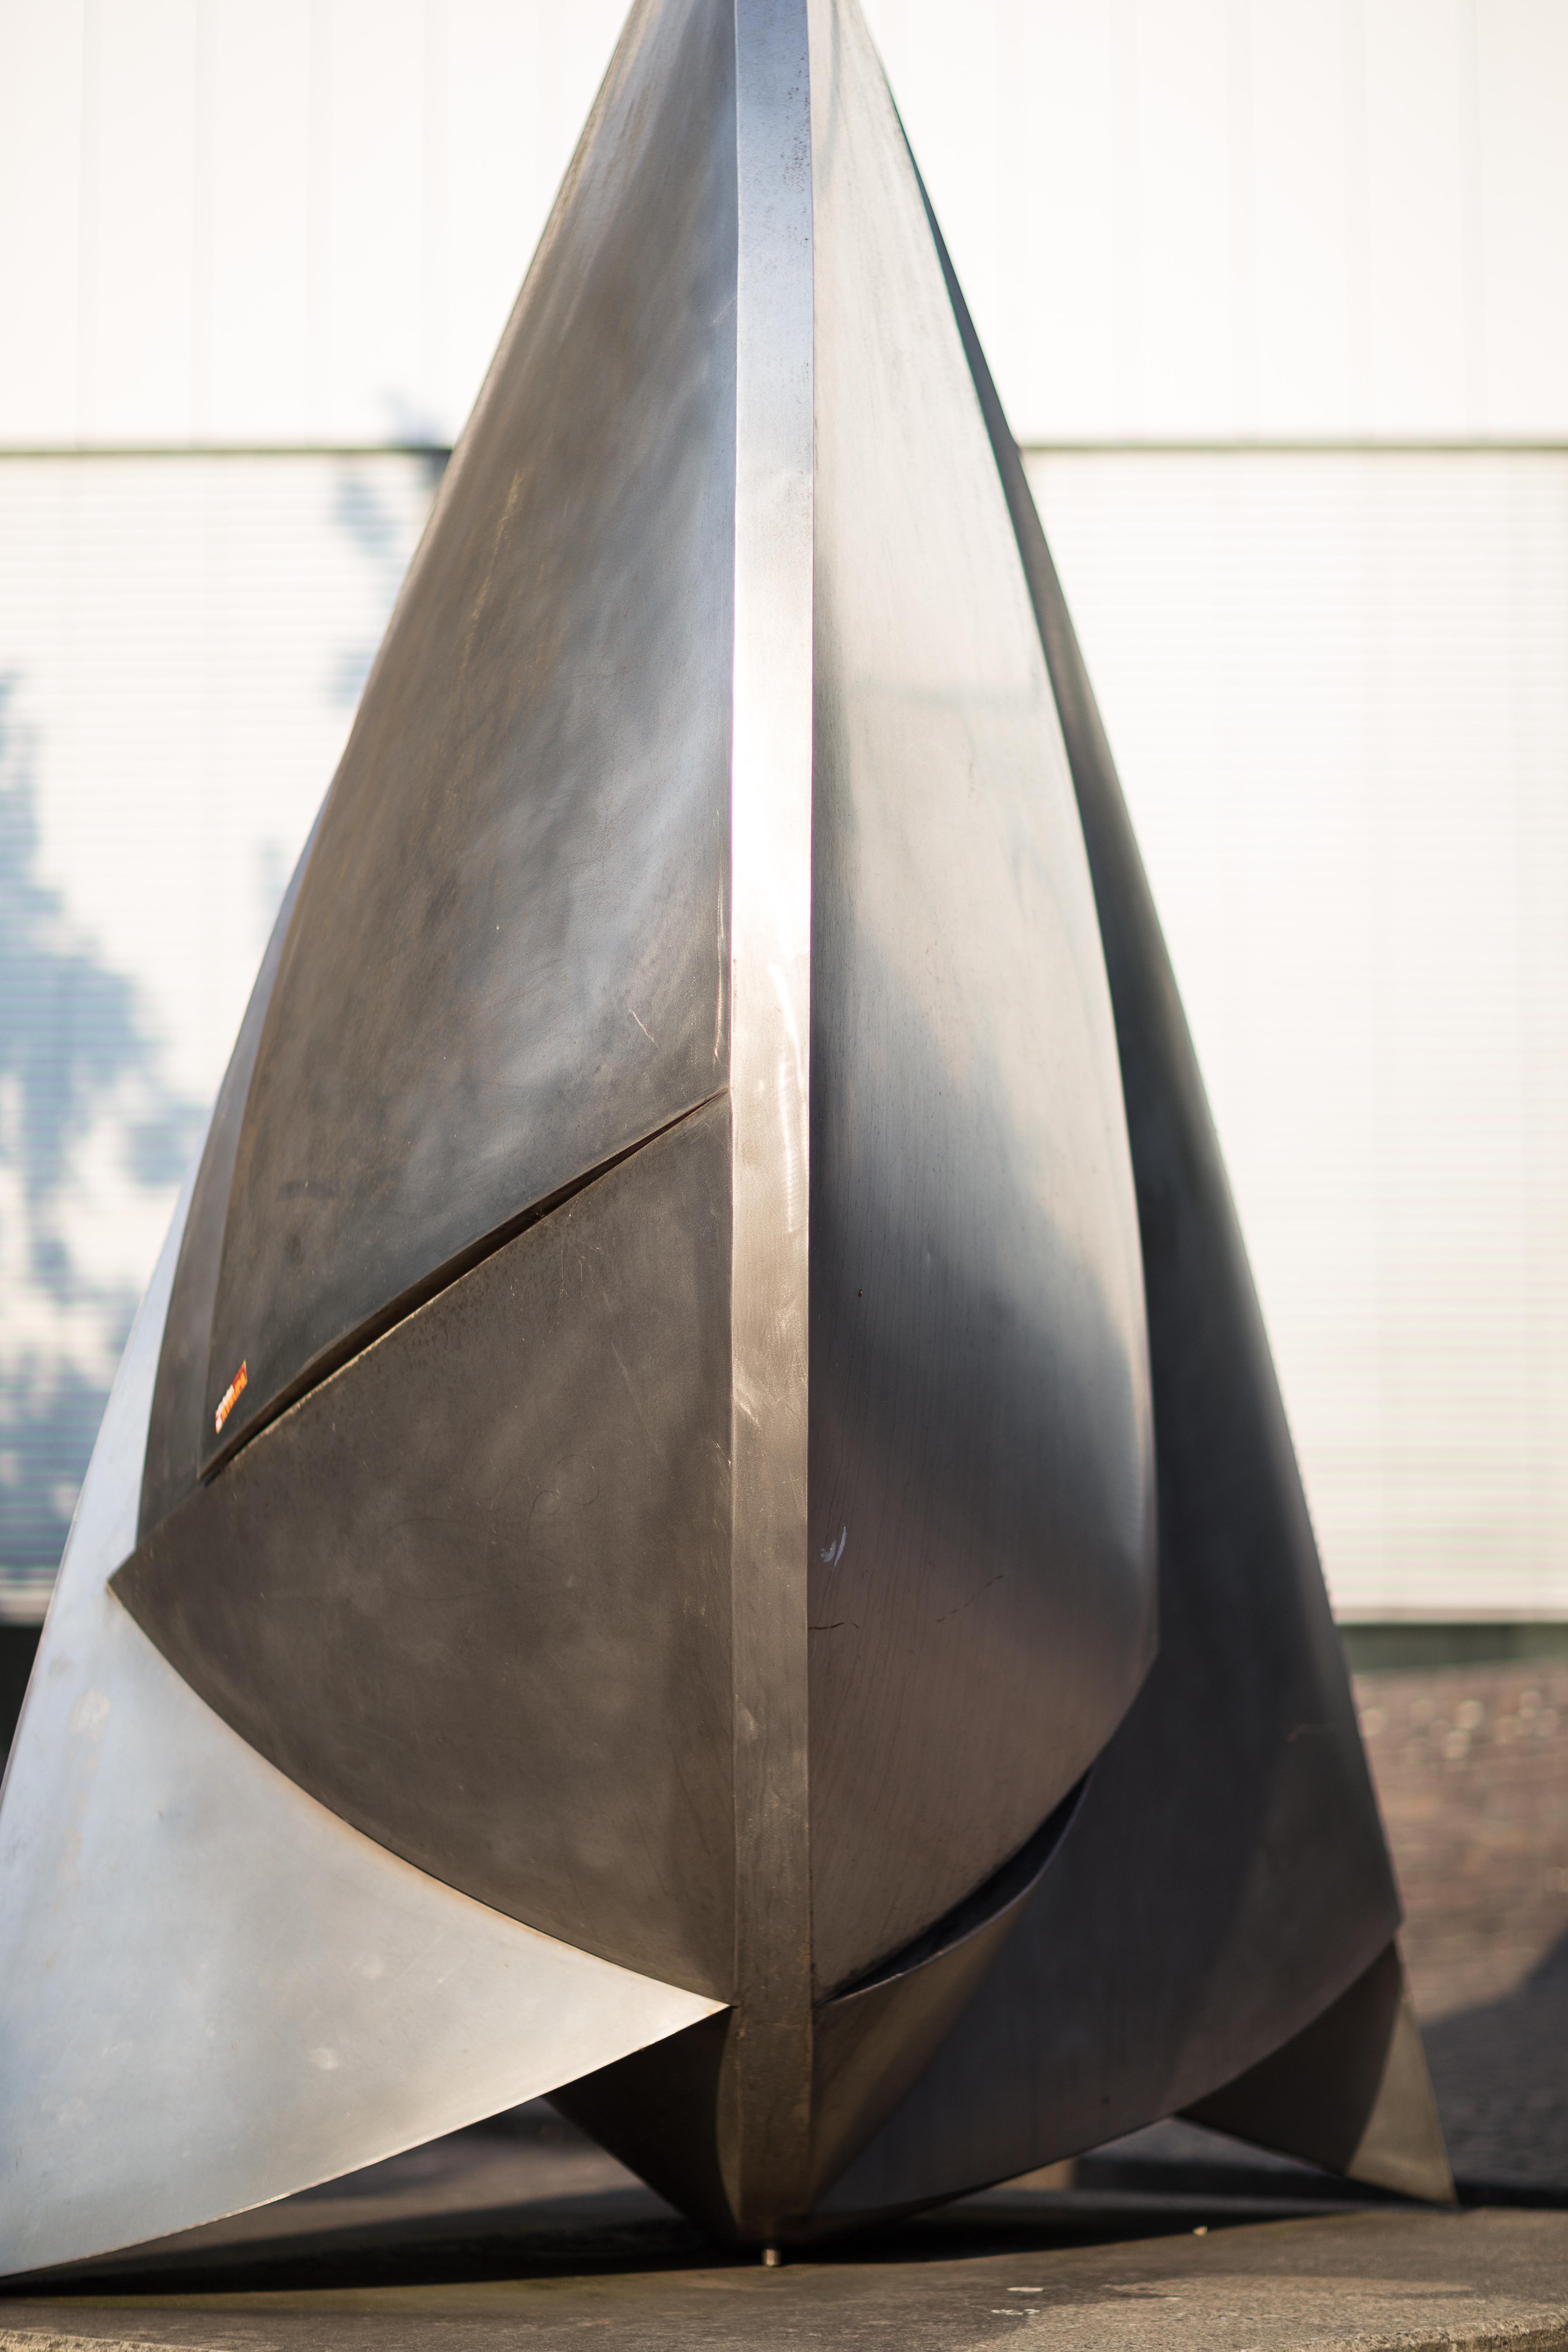 File:Sculpture Stahl 5 81 Erich Hauser Kurt Schwitters Platz Hanover Germany